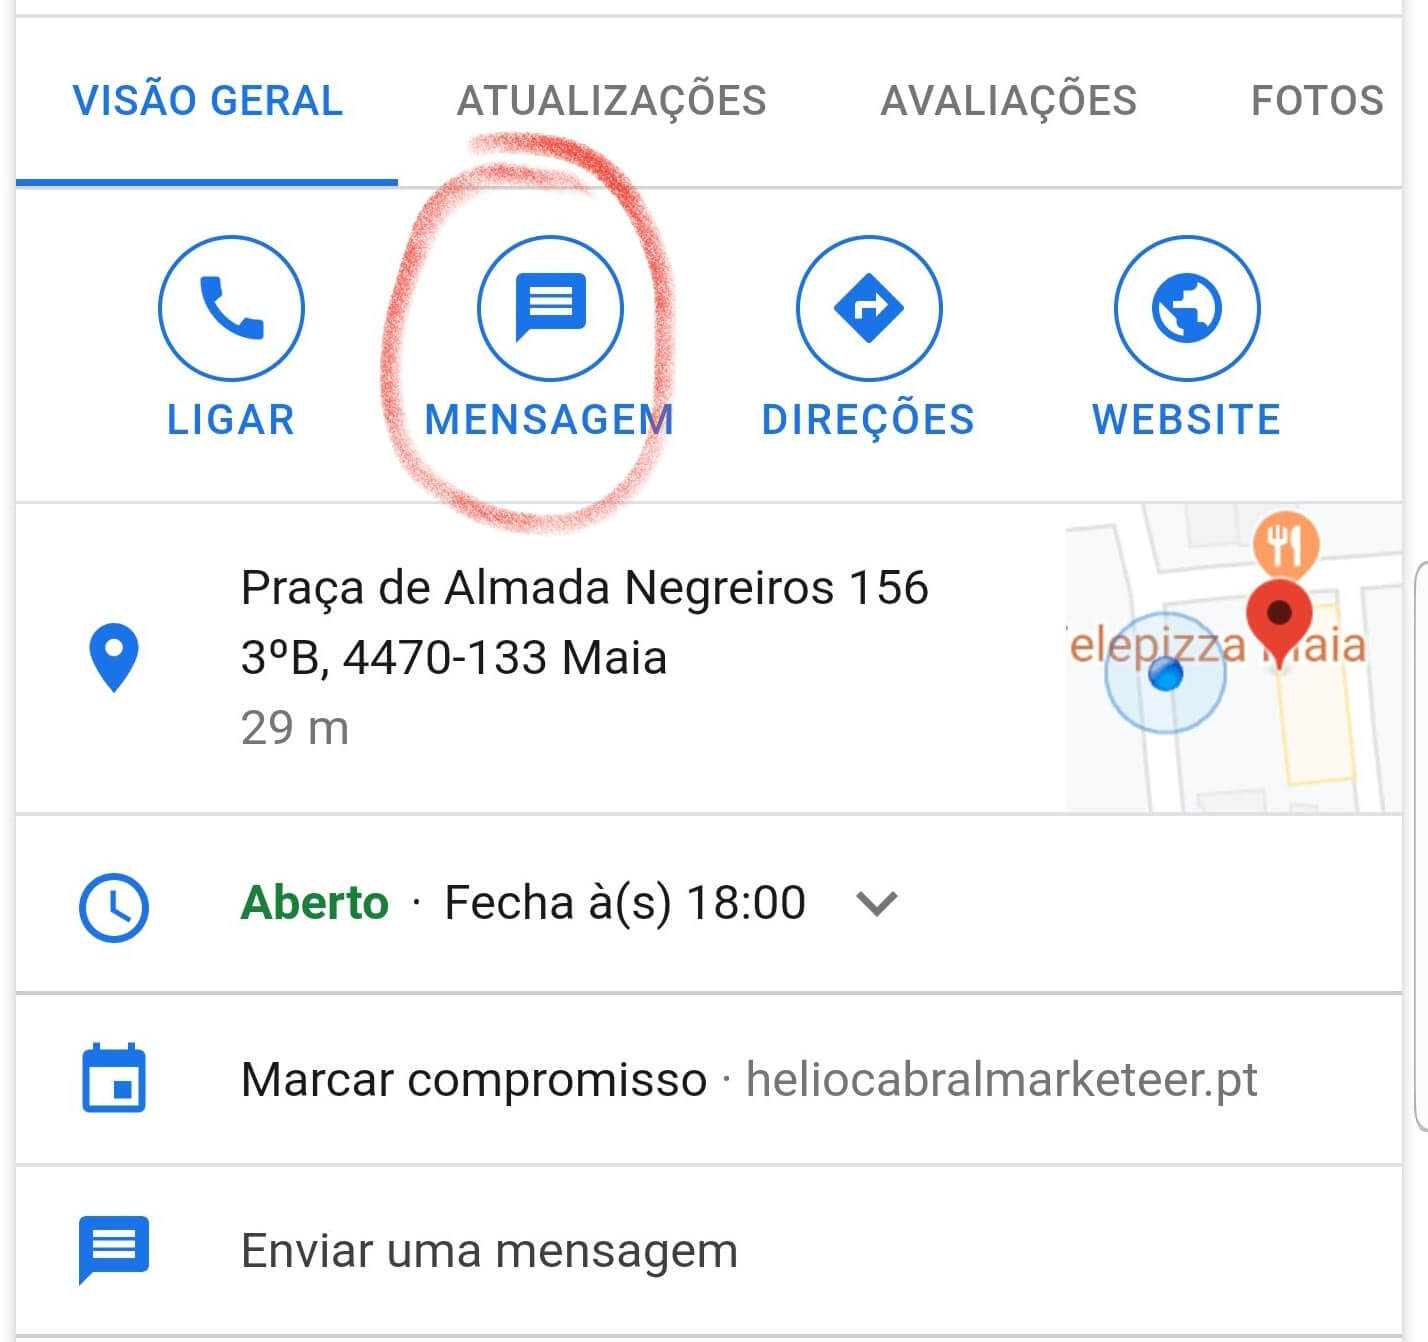 hélio cabral marketeer dicas marketing digital google my business